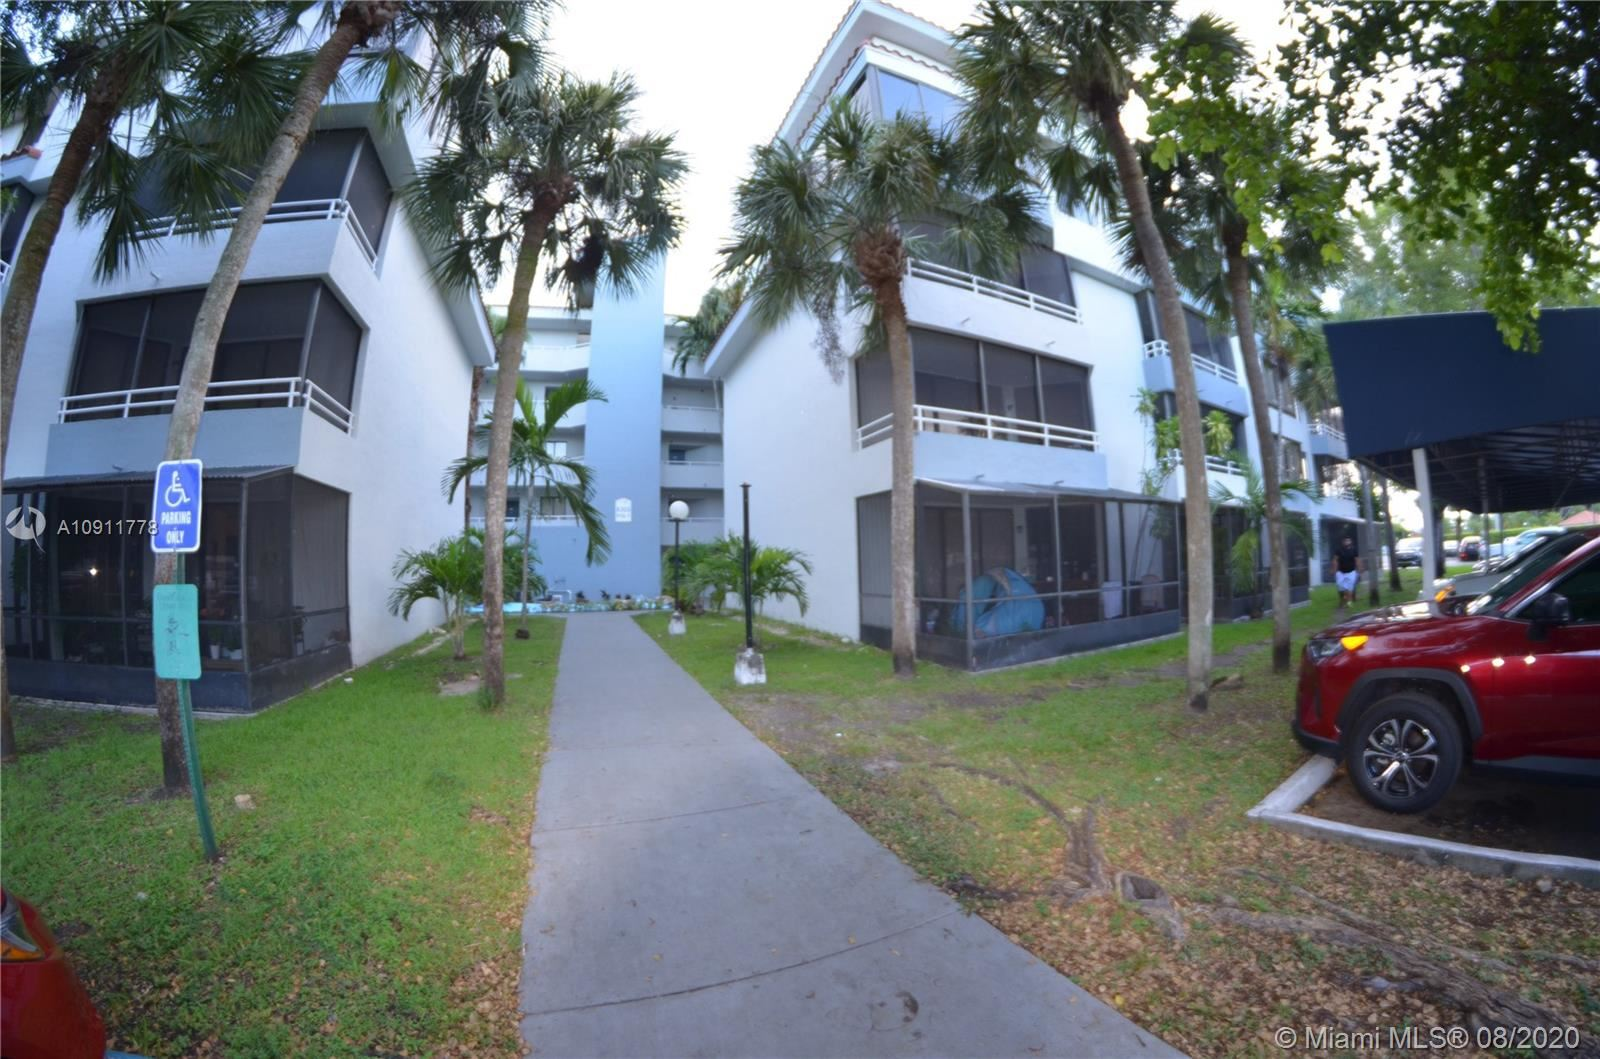 8305 SW 152nd Ave #A-411, Miami, FL 33193 - #: A10911778